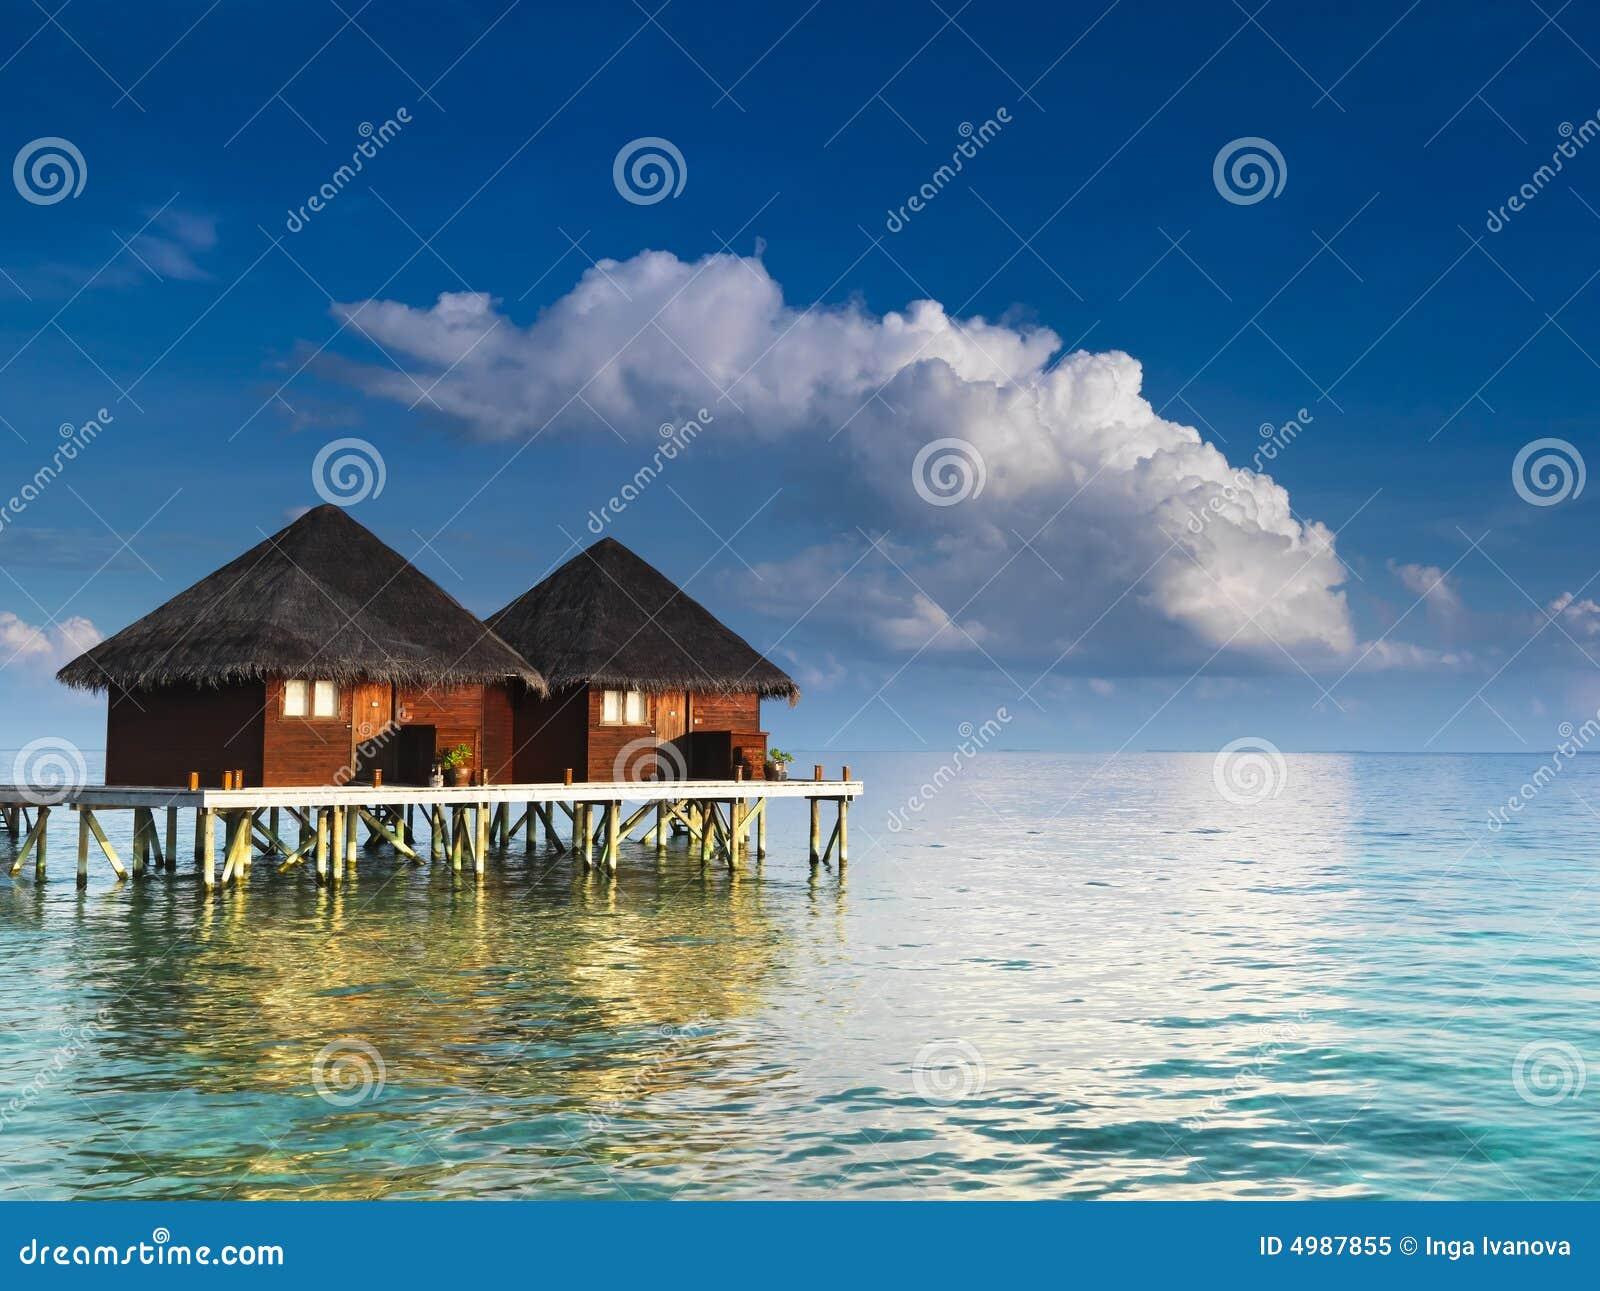 Water villas at tropical resort